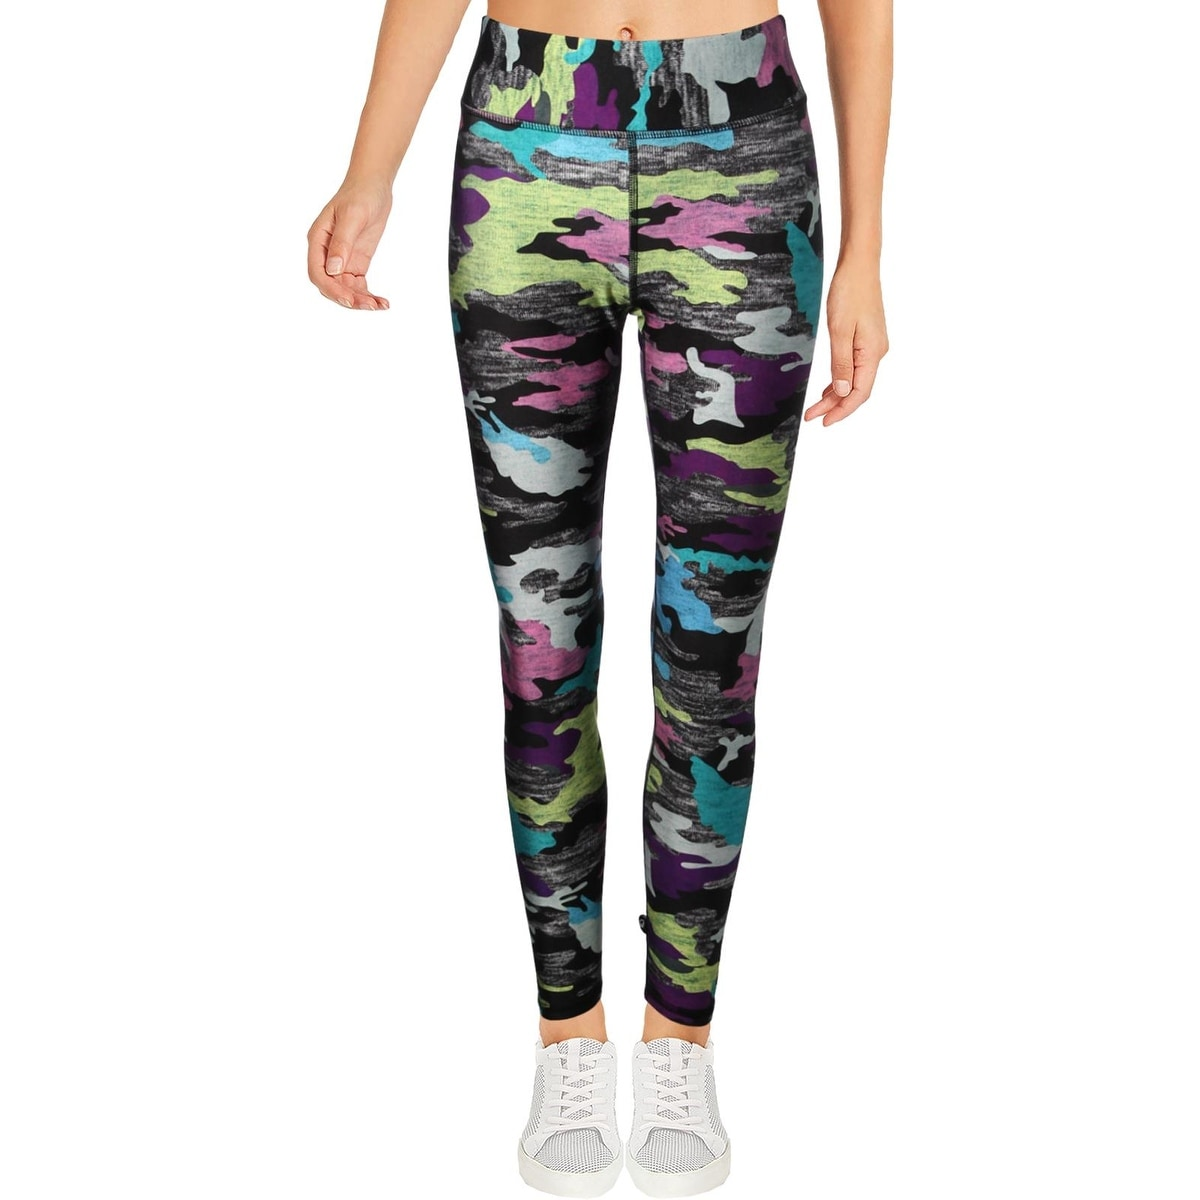 2e570ba6 Shop Zara Terez Womens Athletic Leggings Yoga Fitness - Free Shipping On  Orders Over $45 - Overstock - 17307695